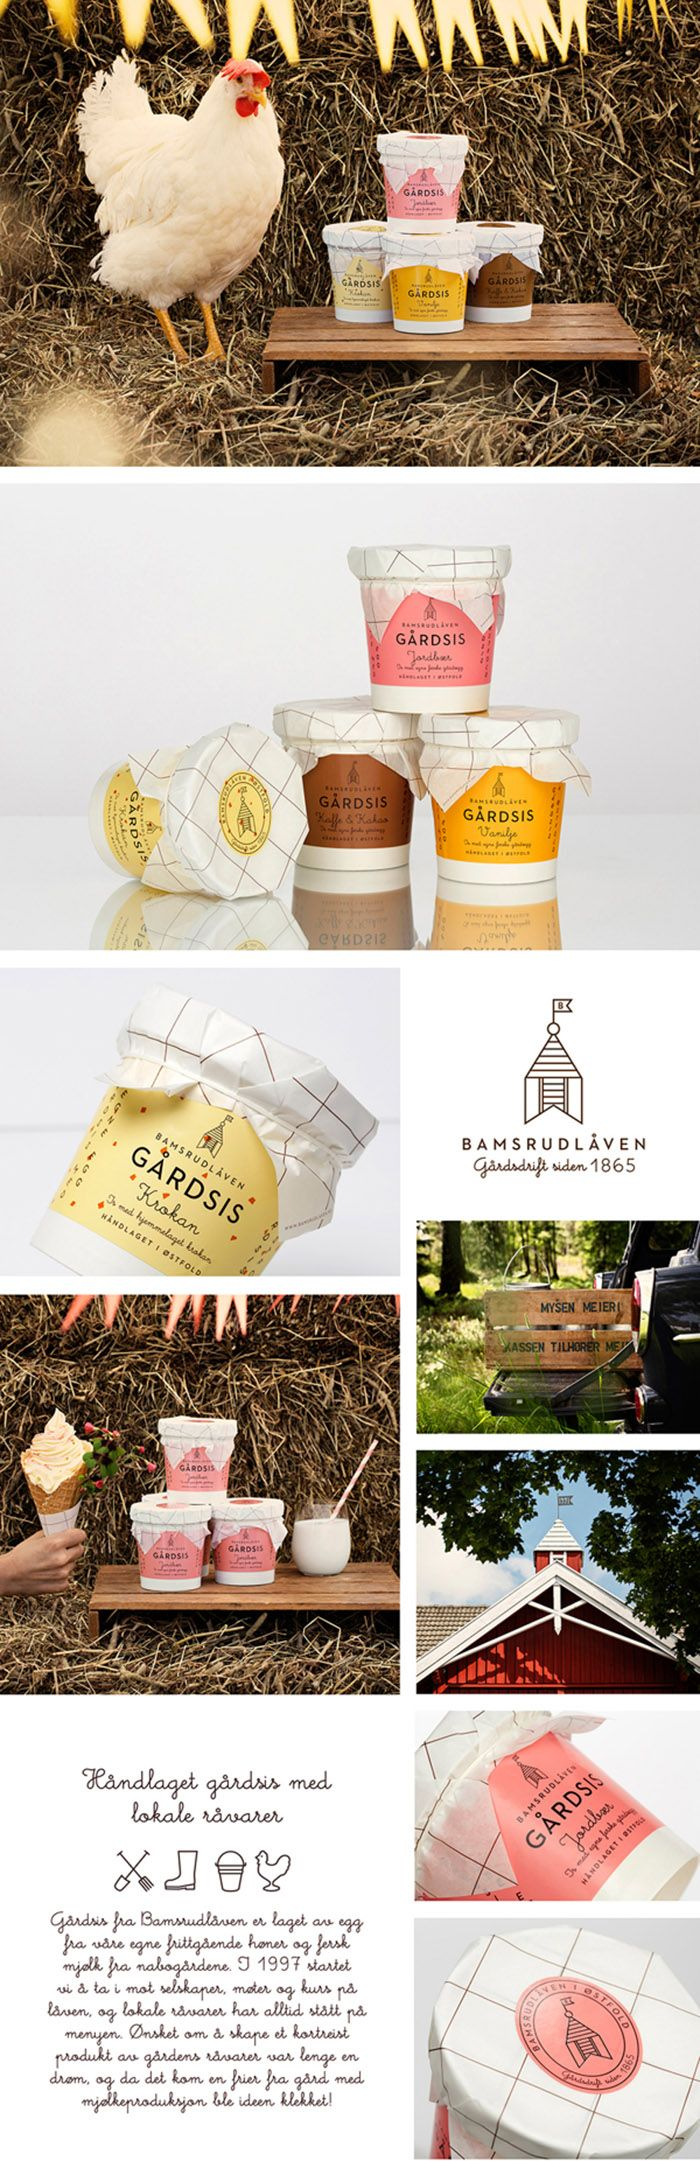 Bamsrudlåven Gårdsis yummy #icecream #Identity #packaging #branding PD